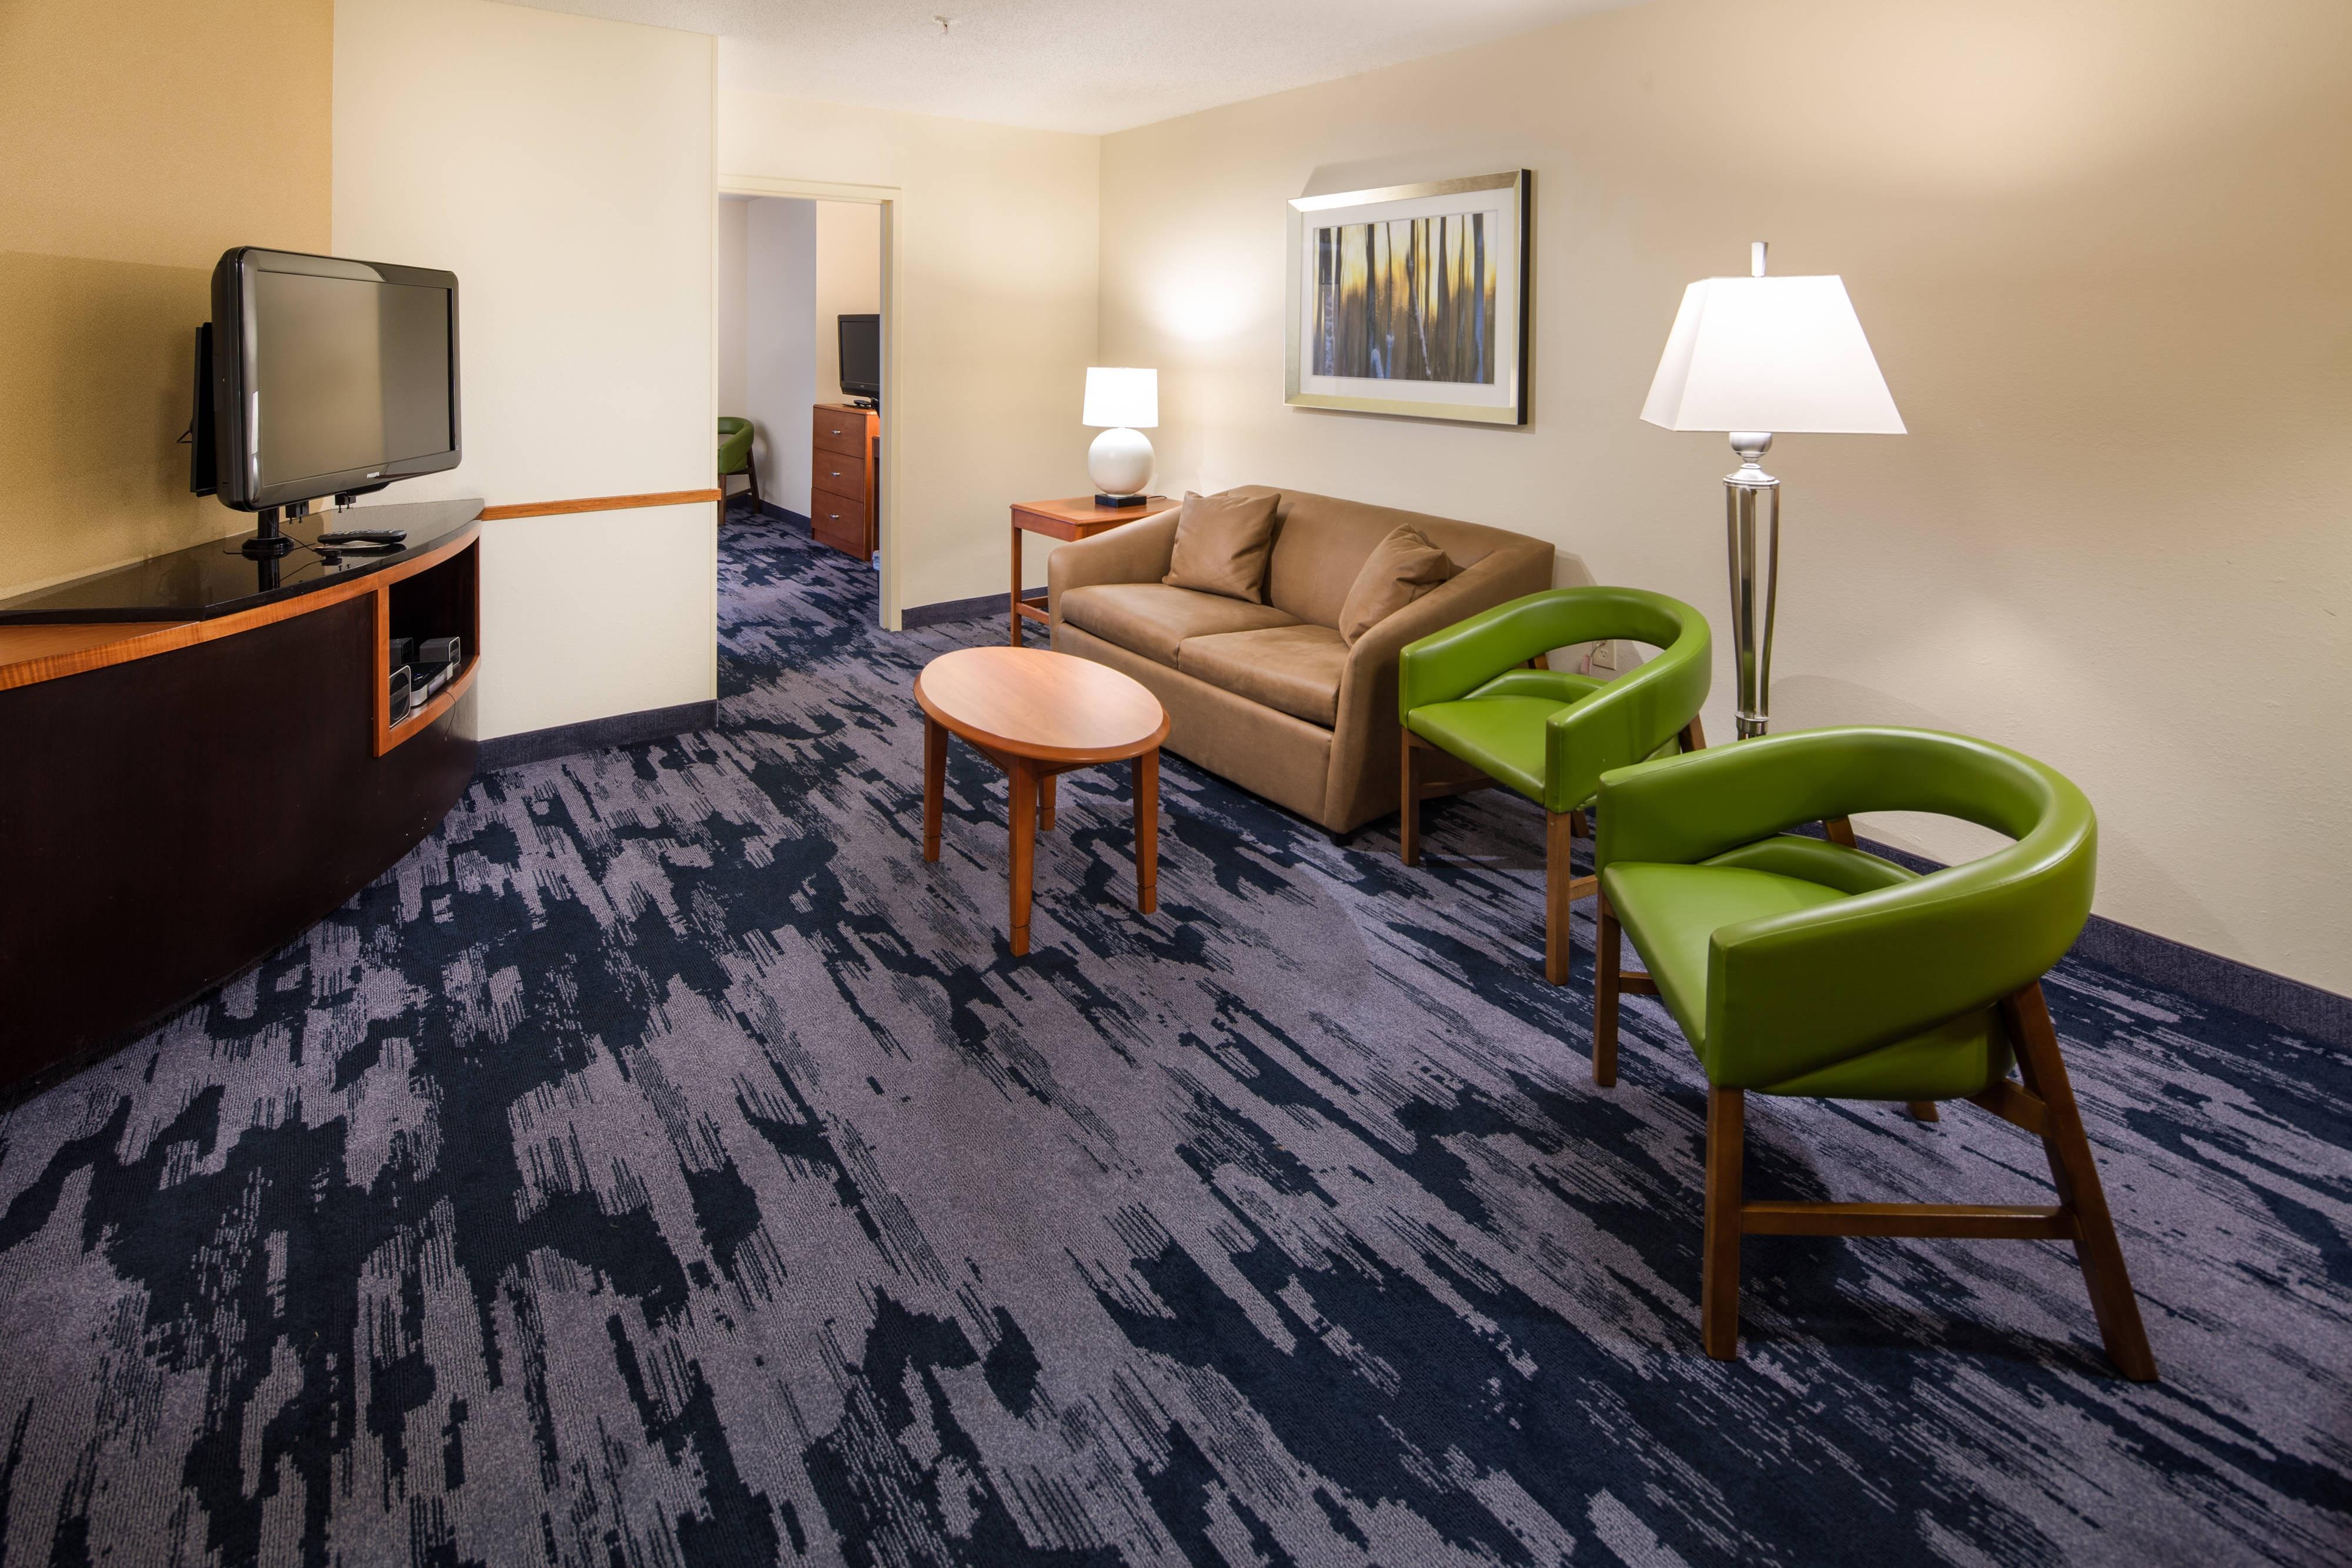 Suite cama tamaño King - Sala de estar